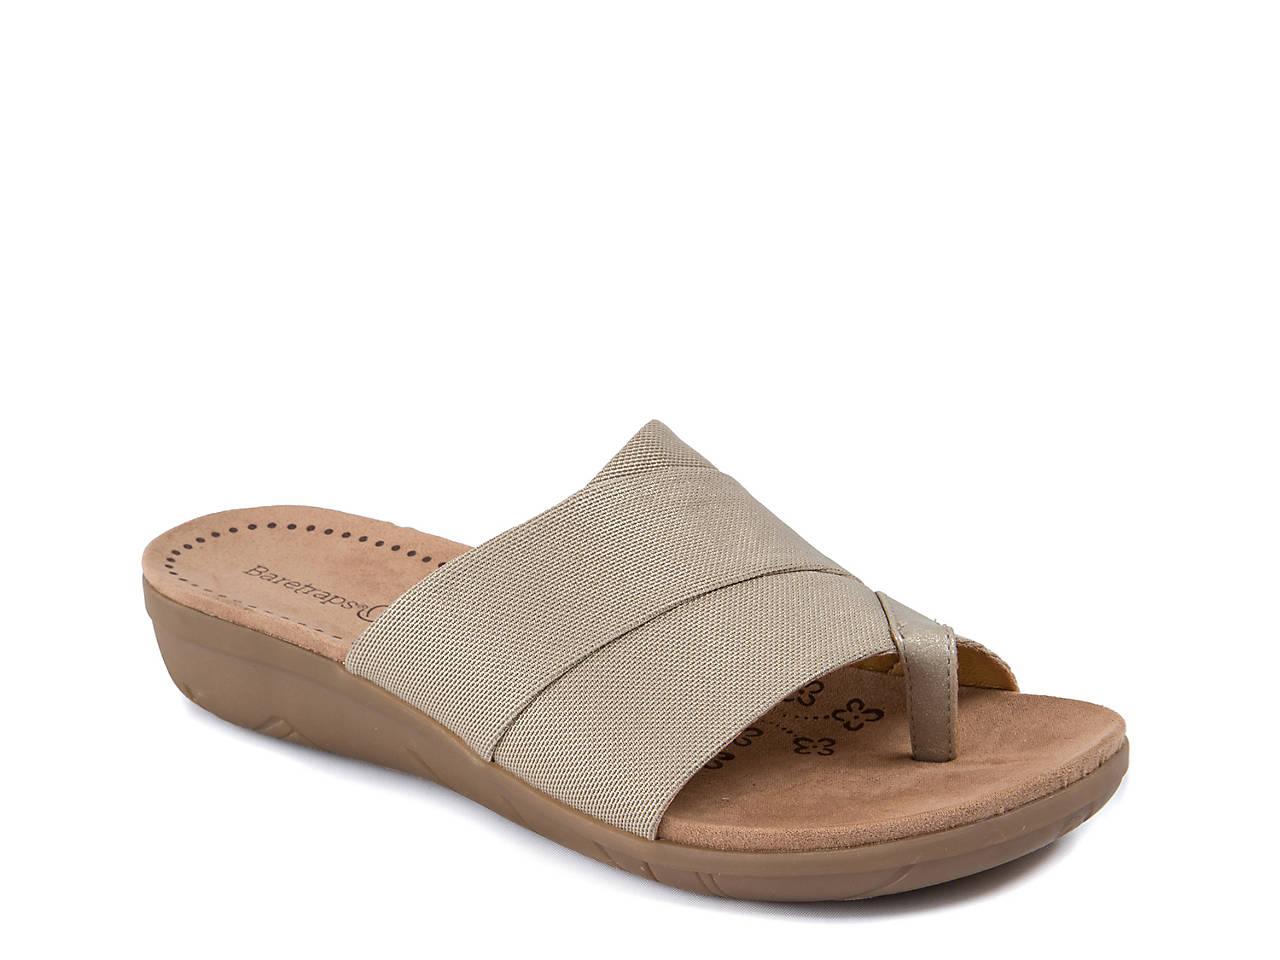 24a2675891 Bare Traps Jodey Wedge Sandal Women's Shoes   DSW